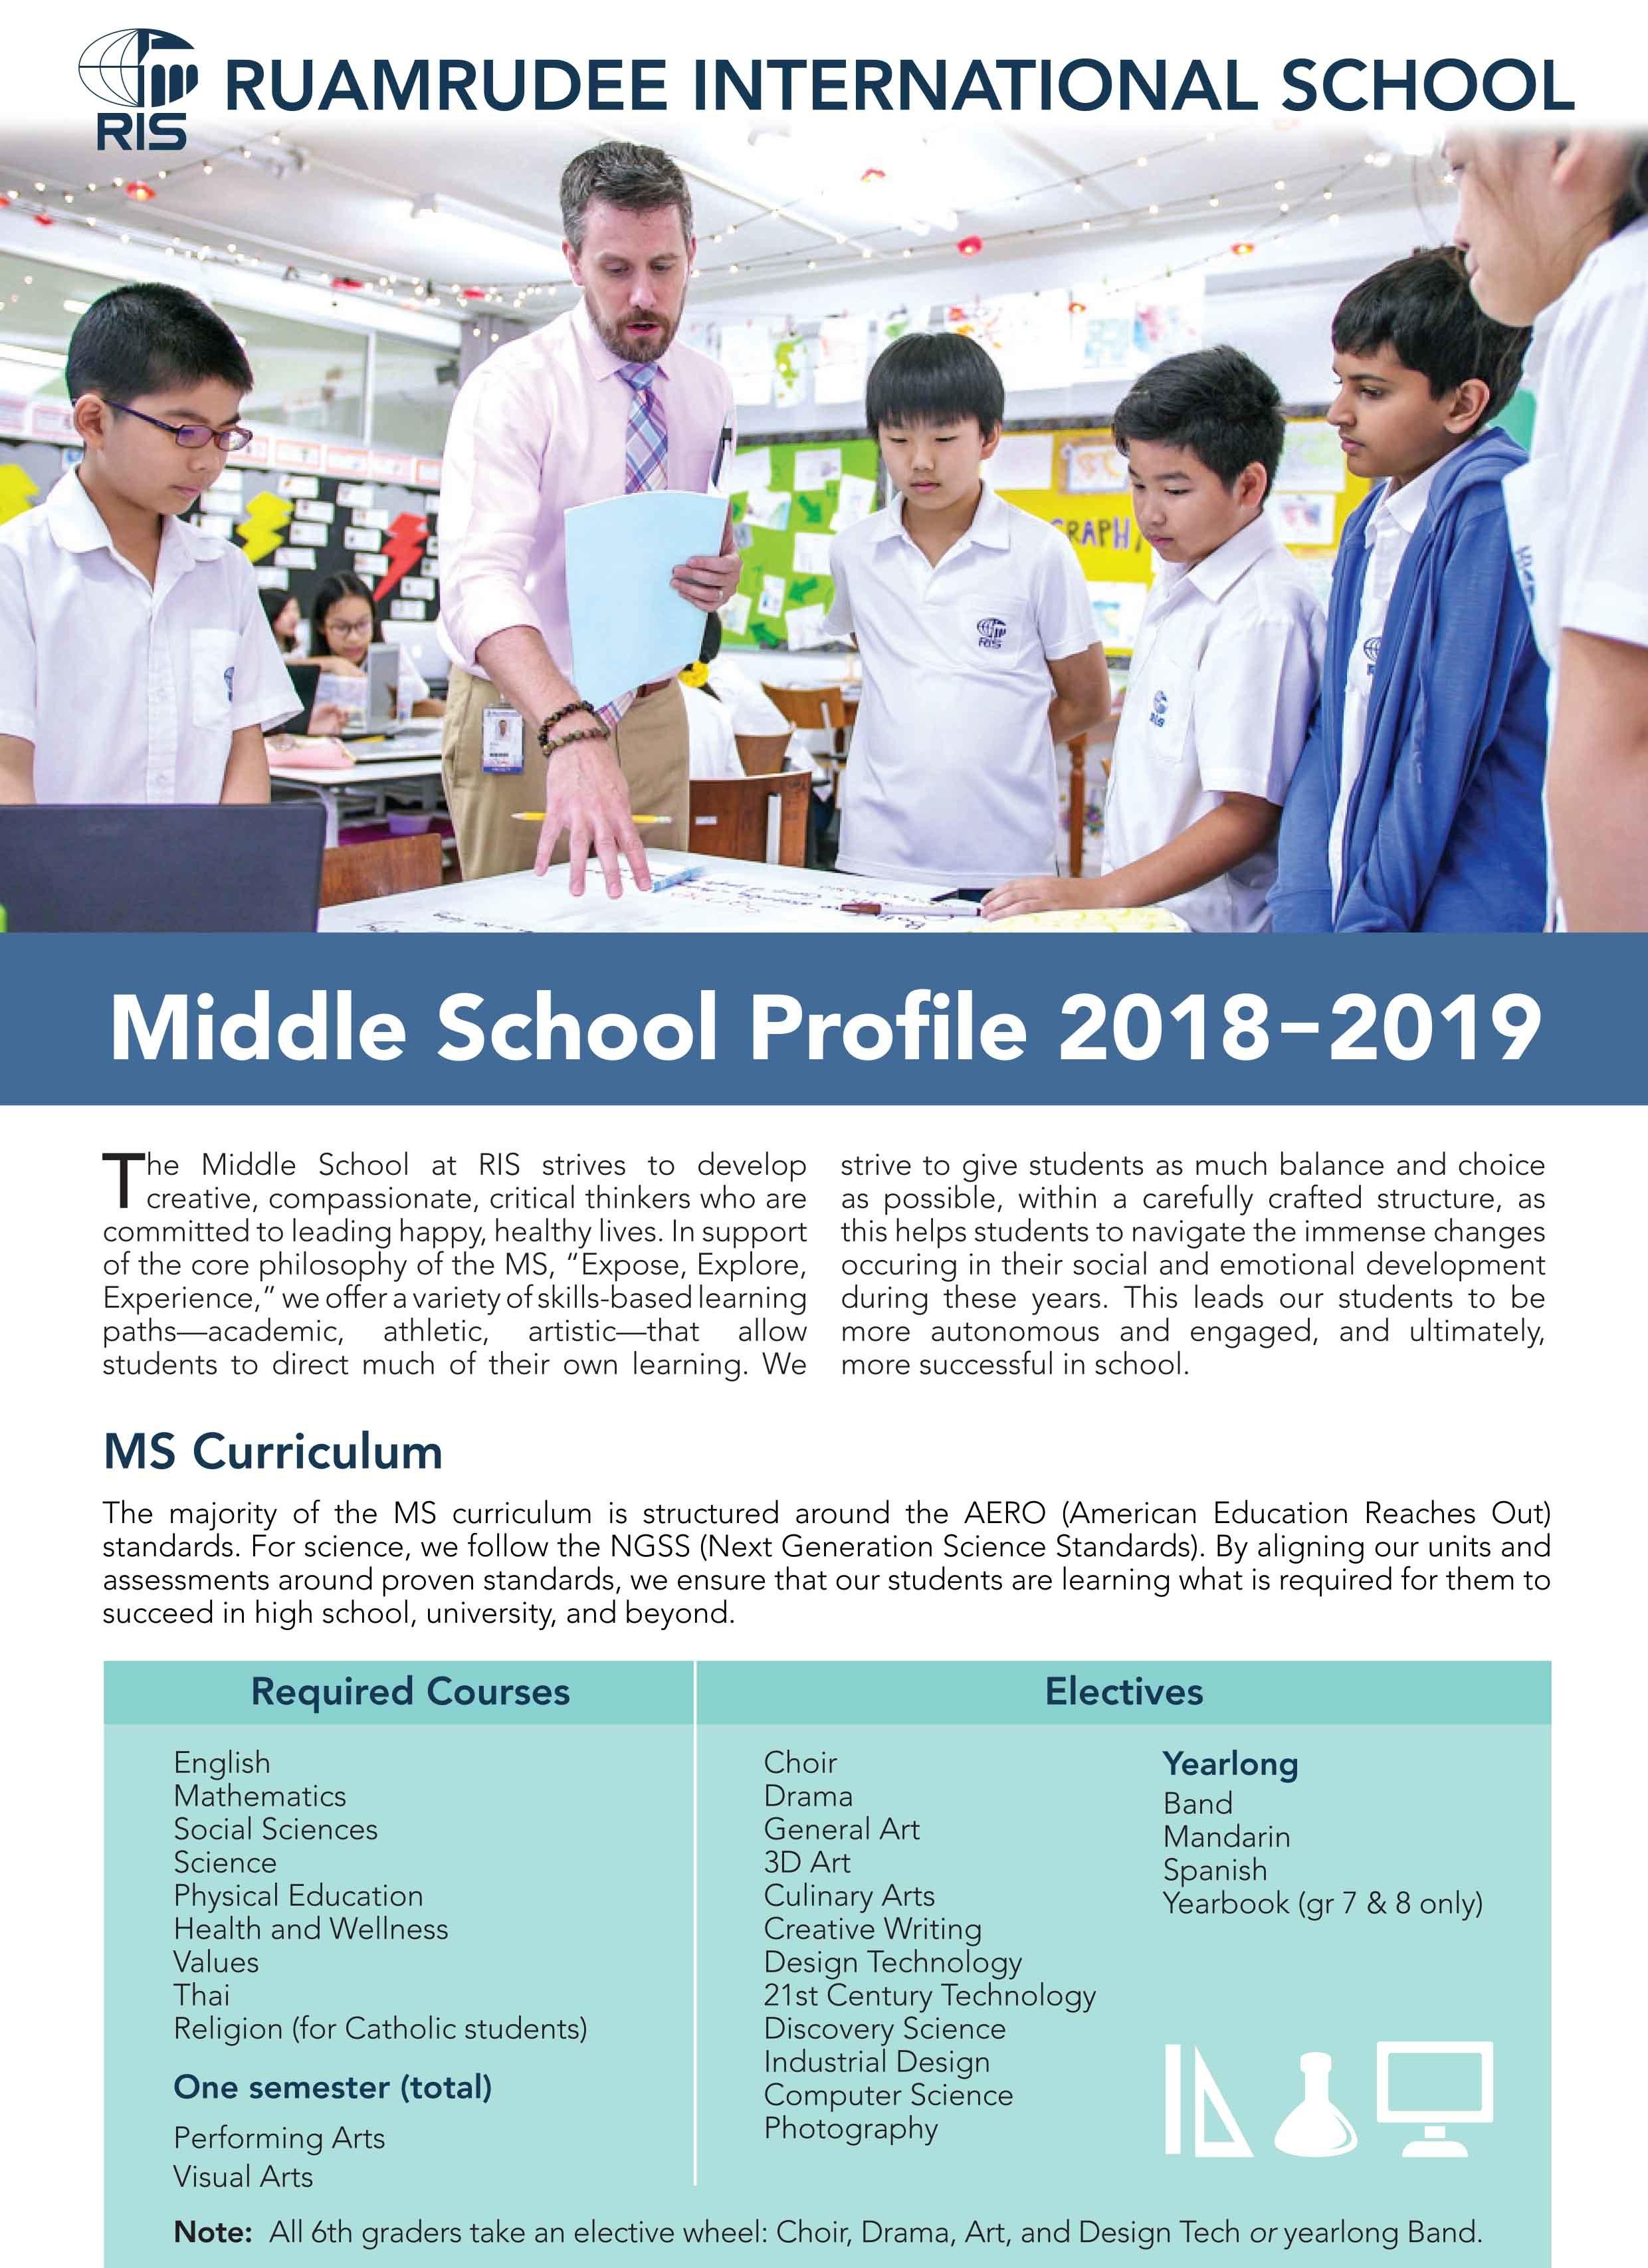 Middle School | RIS